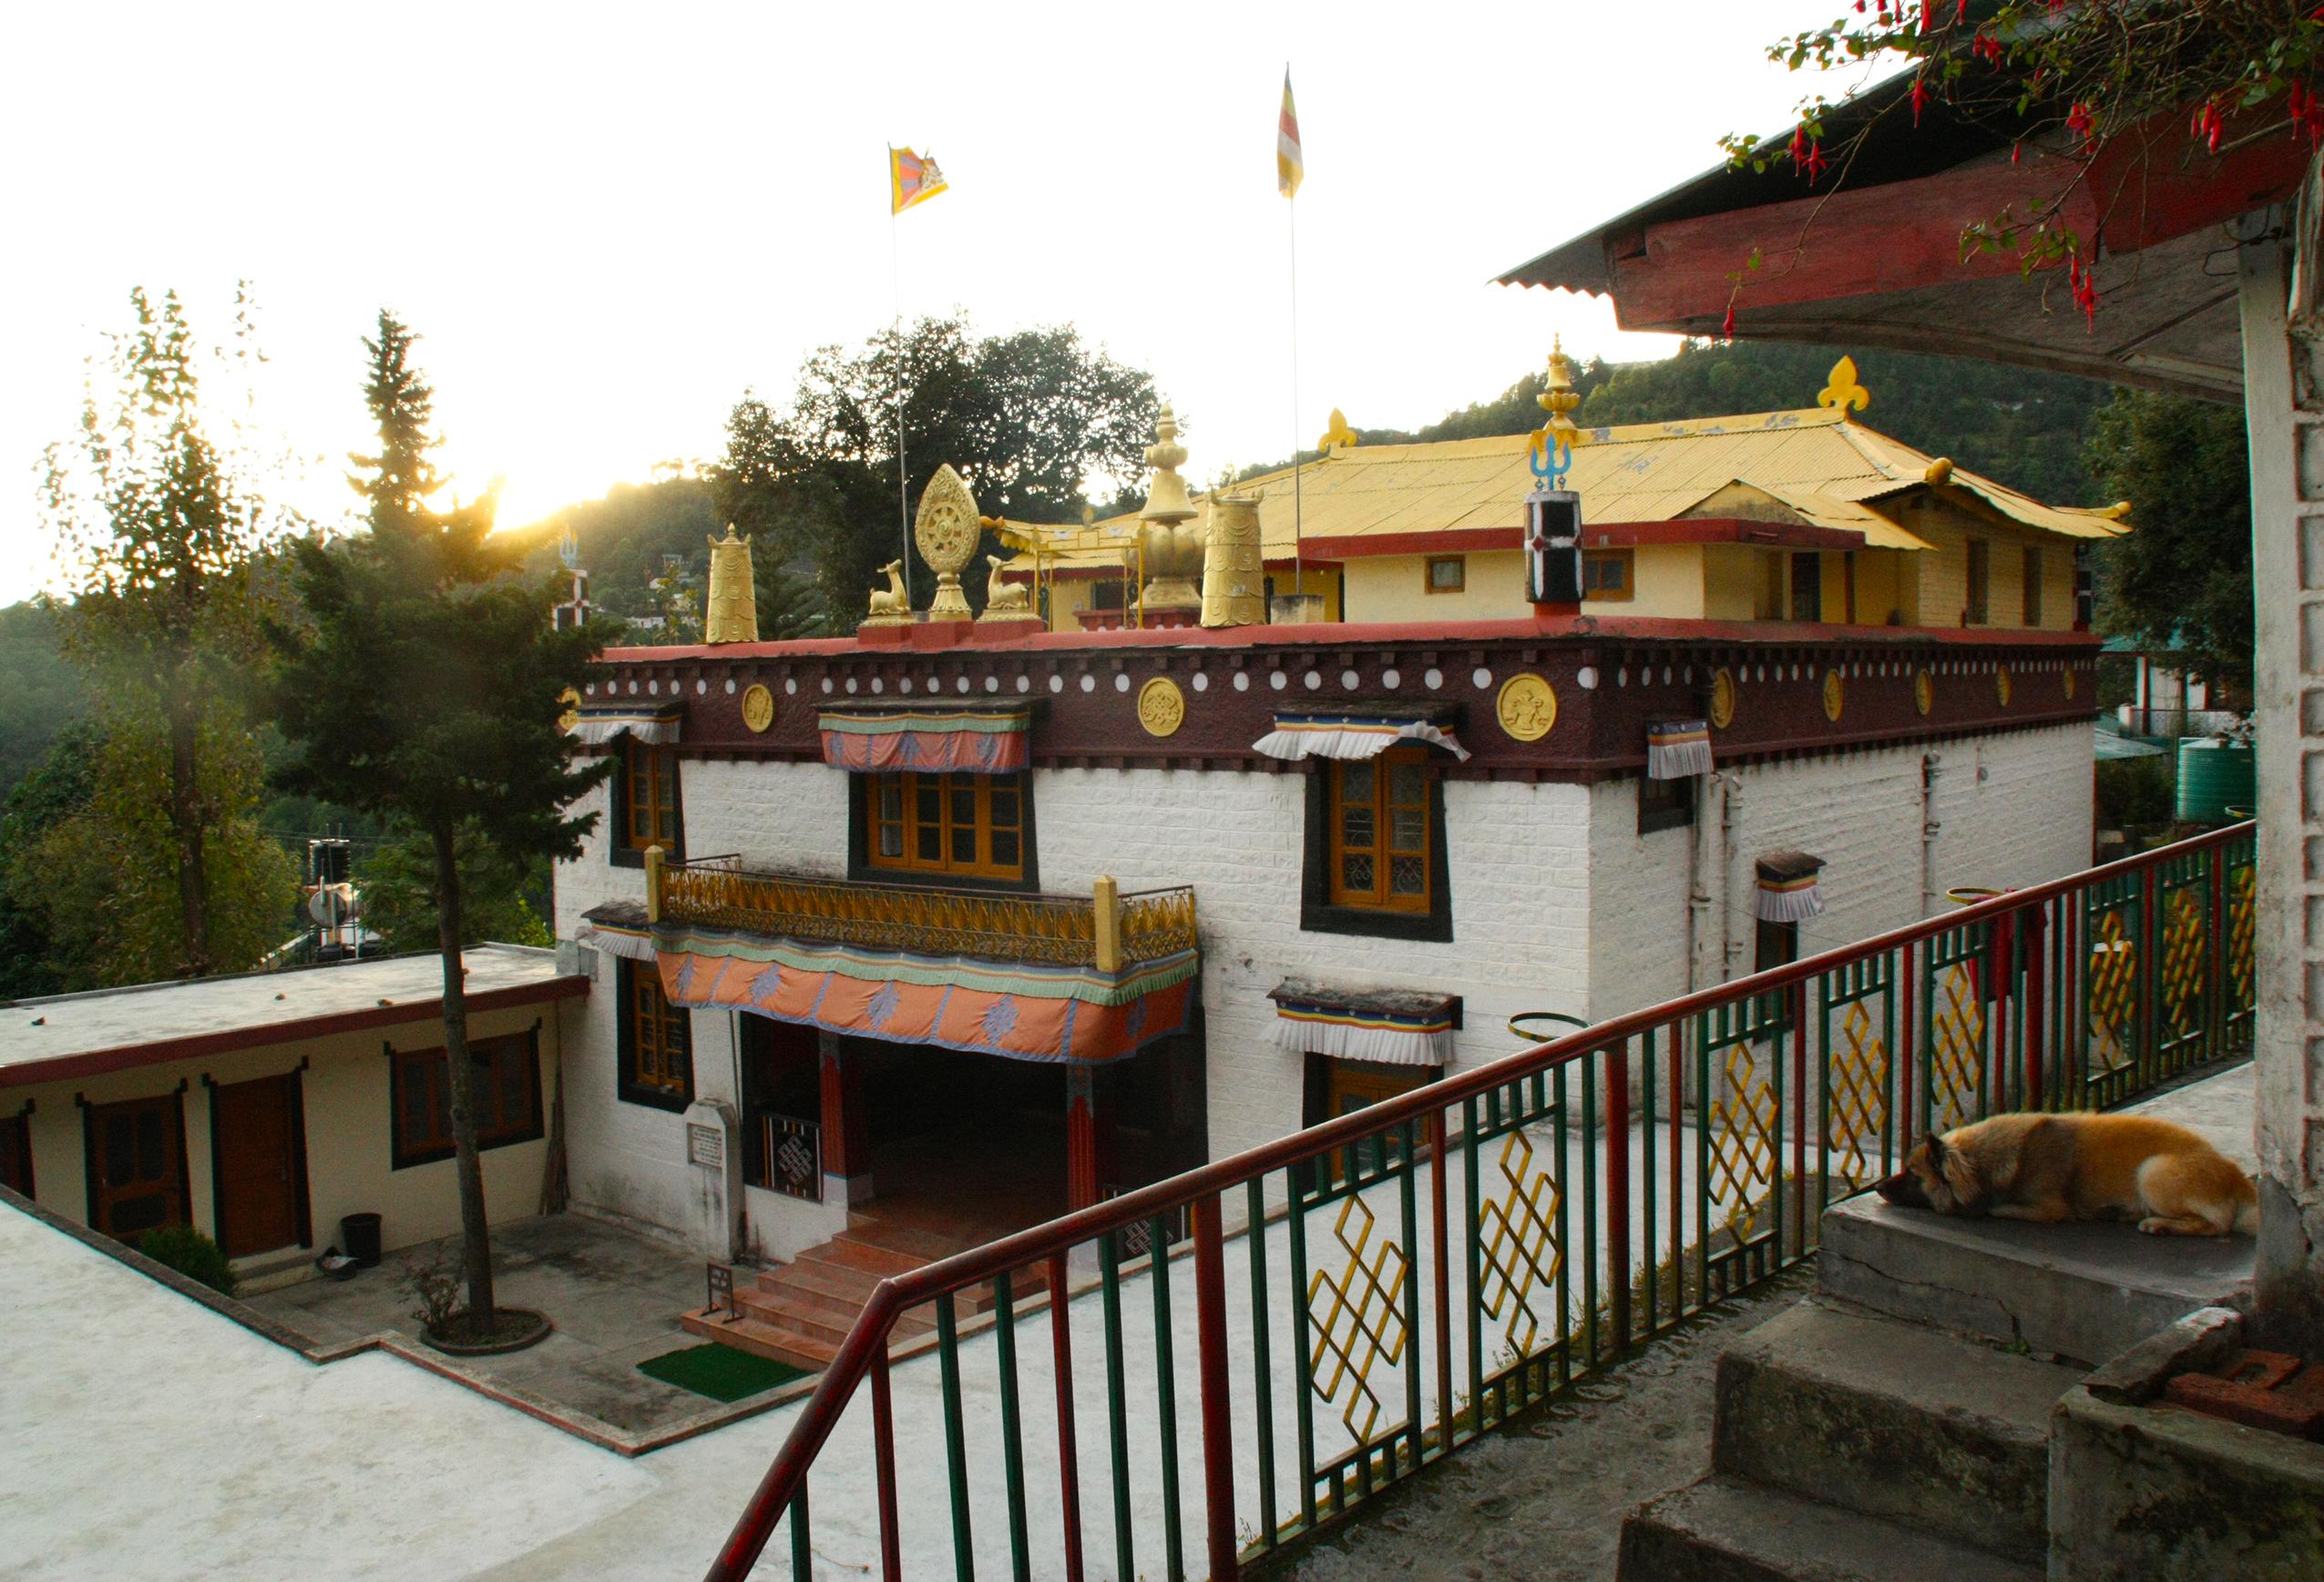 Tse Chokling Monastery (McLeod Ganj, Himachal Pradesh)